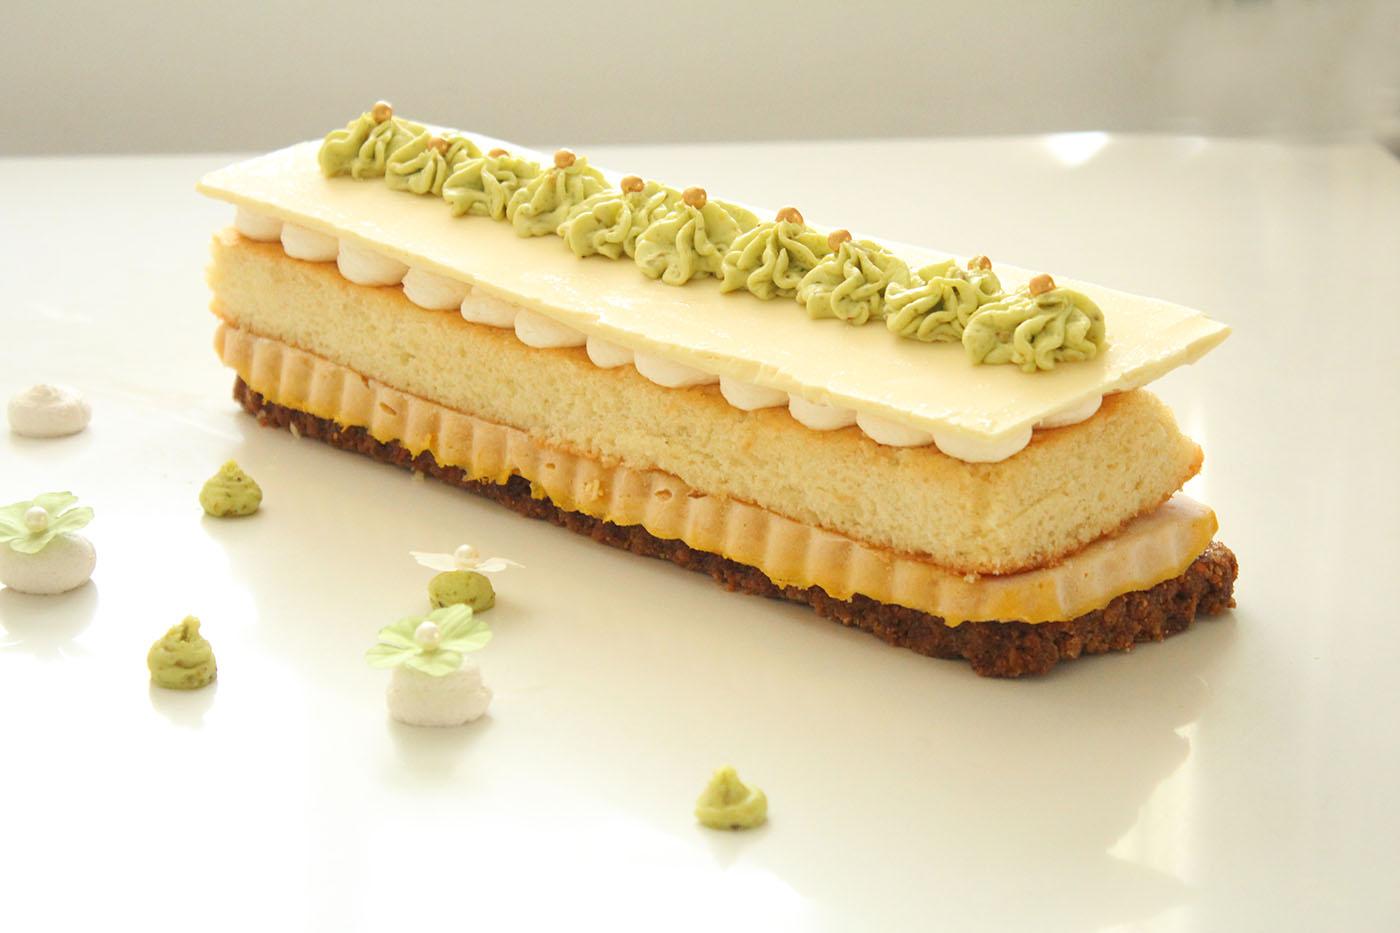 IMG 9250 - עוגת שכבות אקזותית